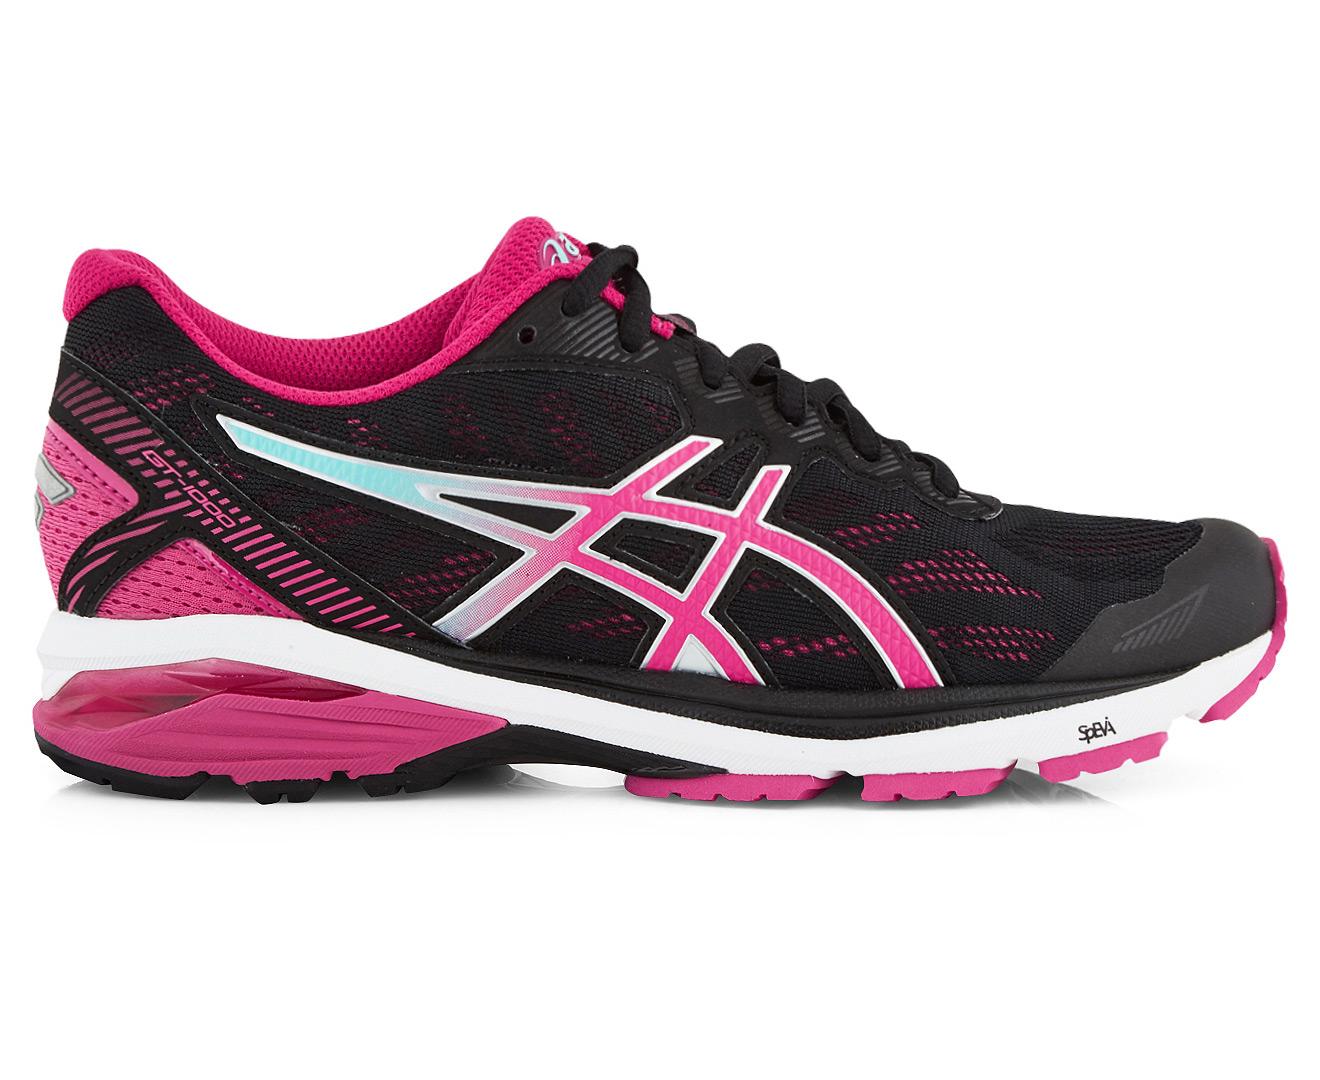 Asics Women S Gt 1000 5 Shoe Black Sport Pink Aruba Blue